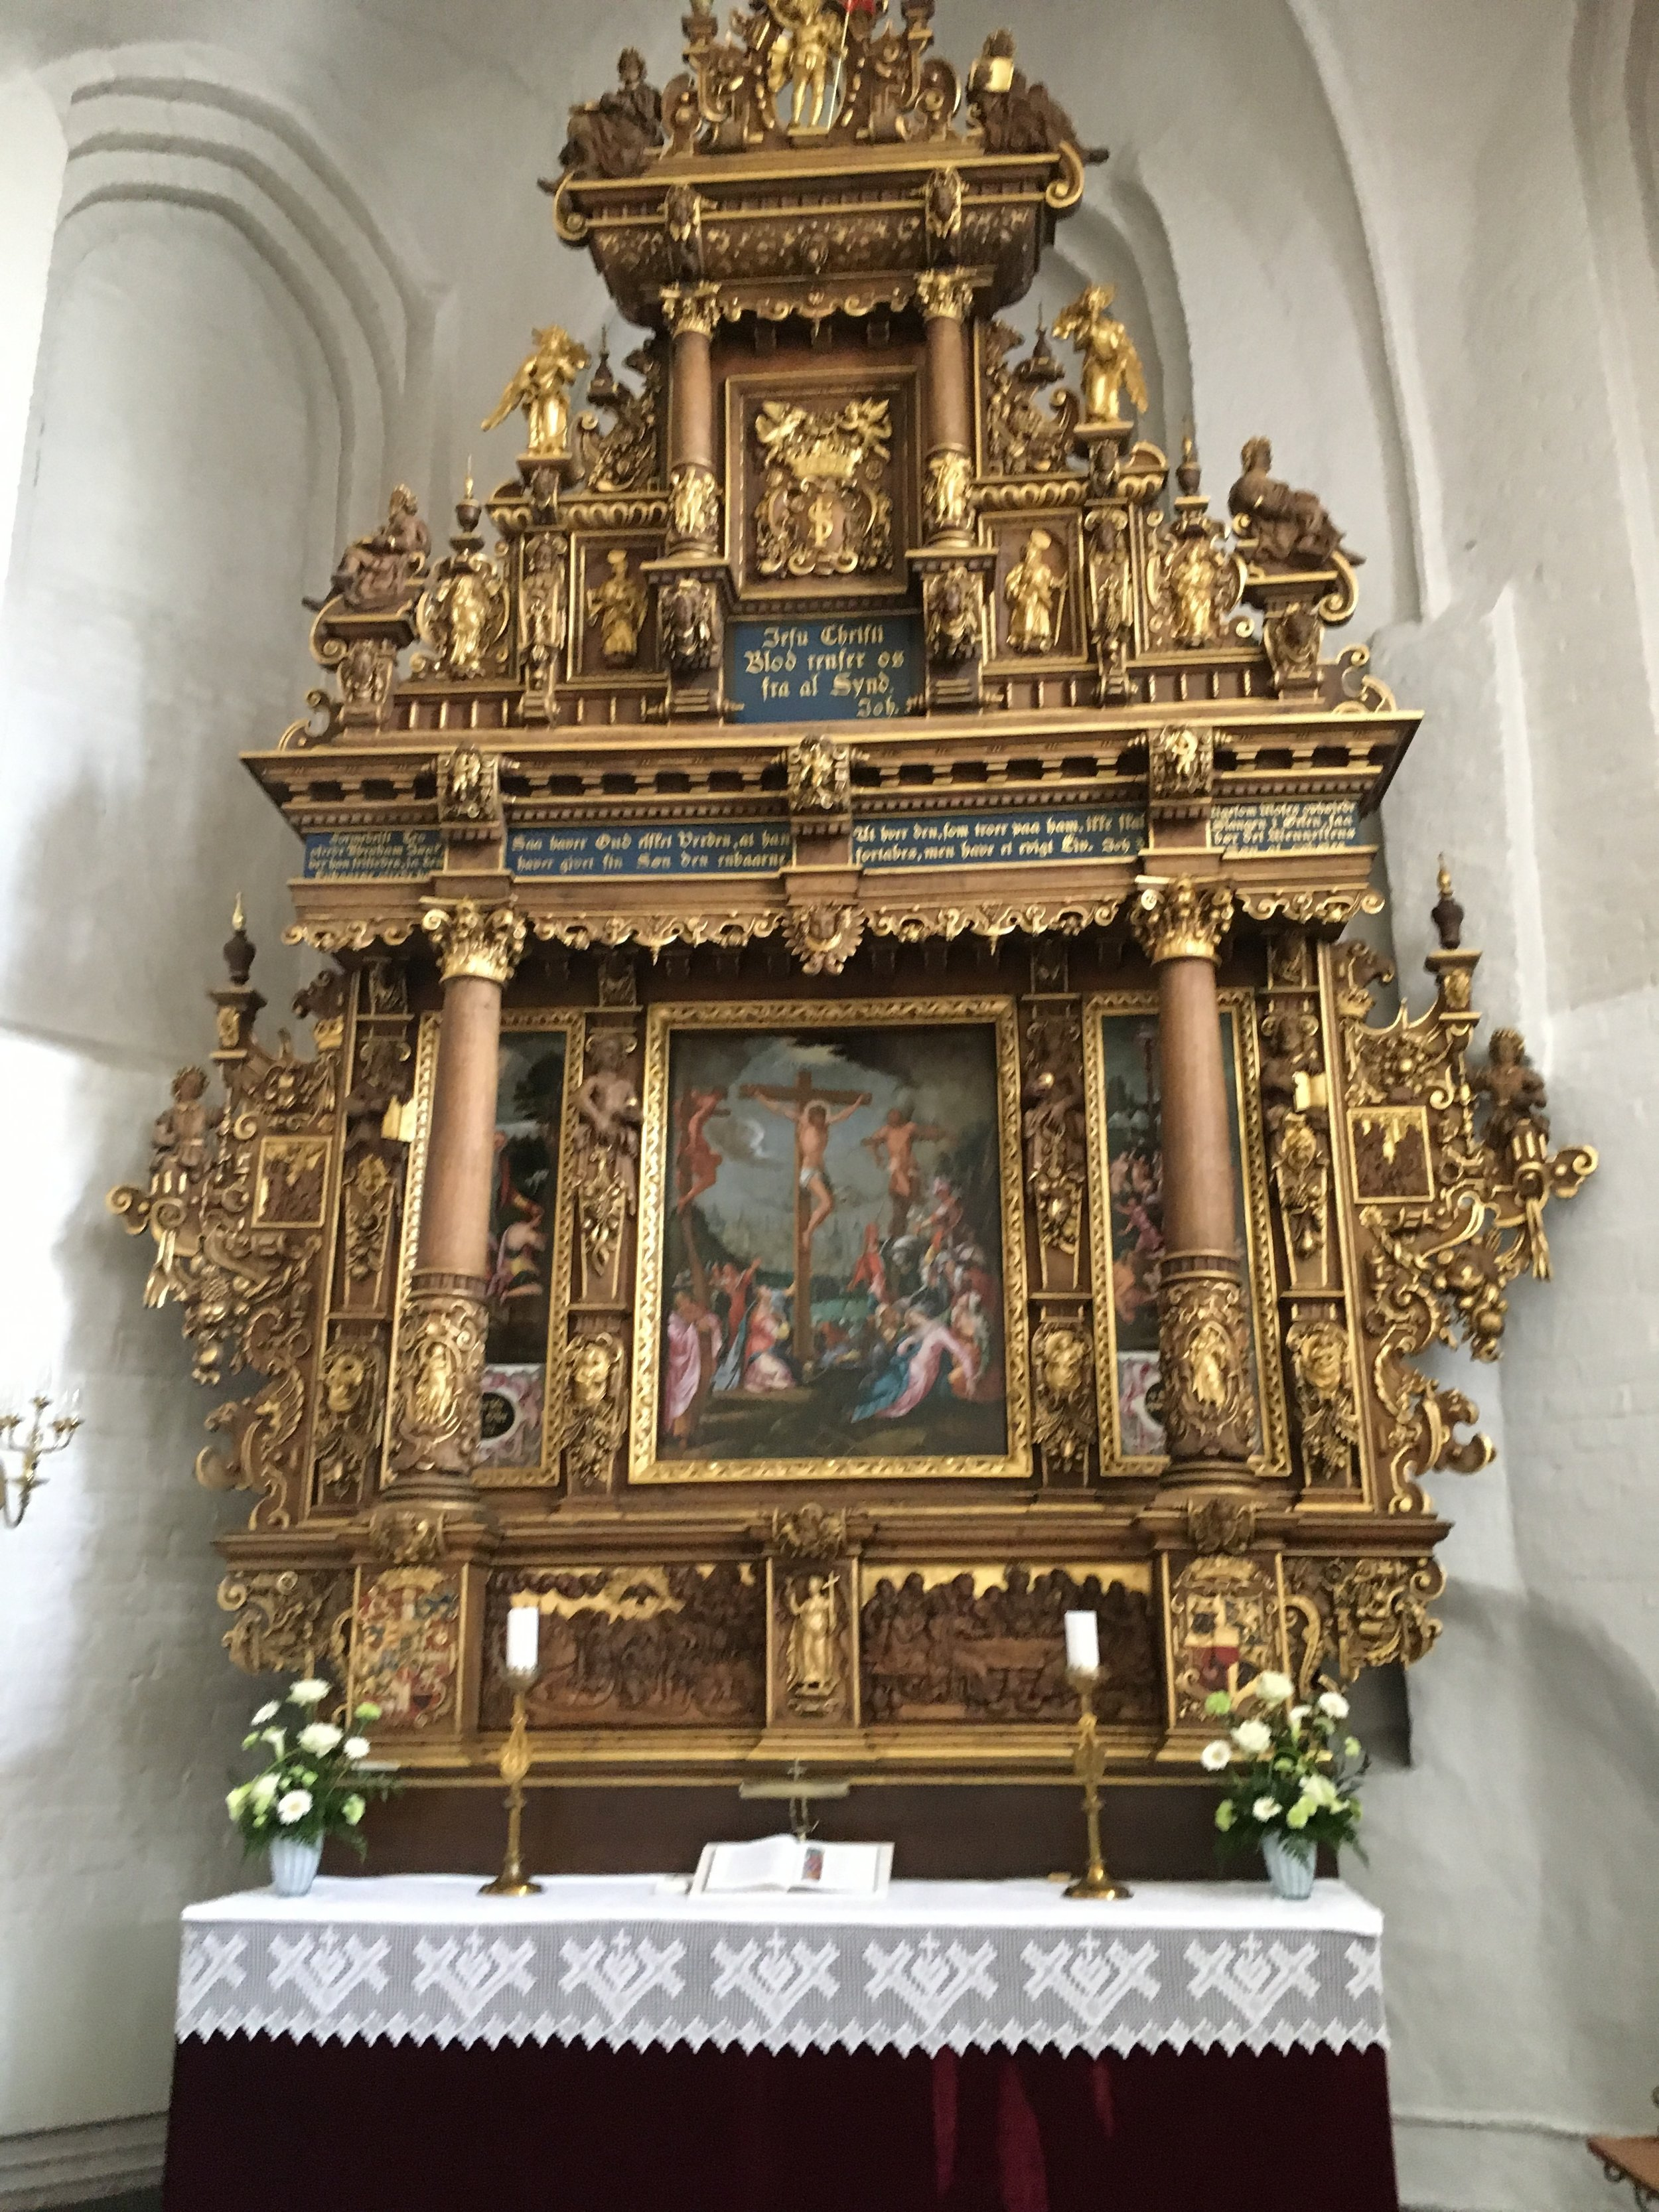 Altertavlen i Klosterkirken, Nykøbing F